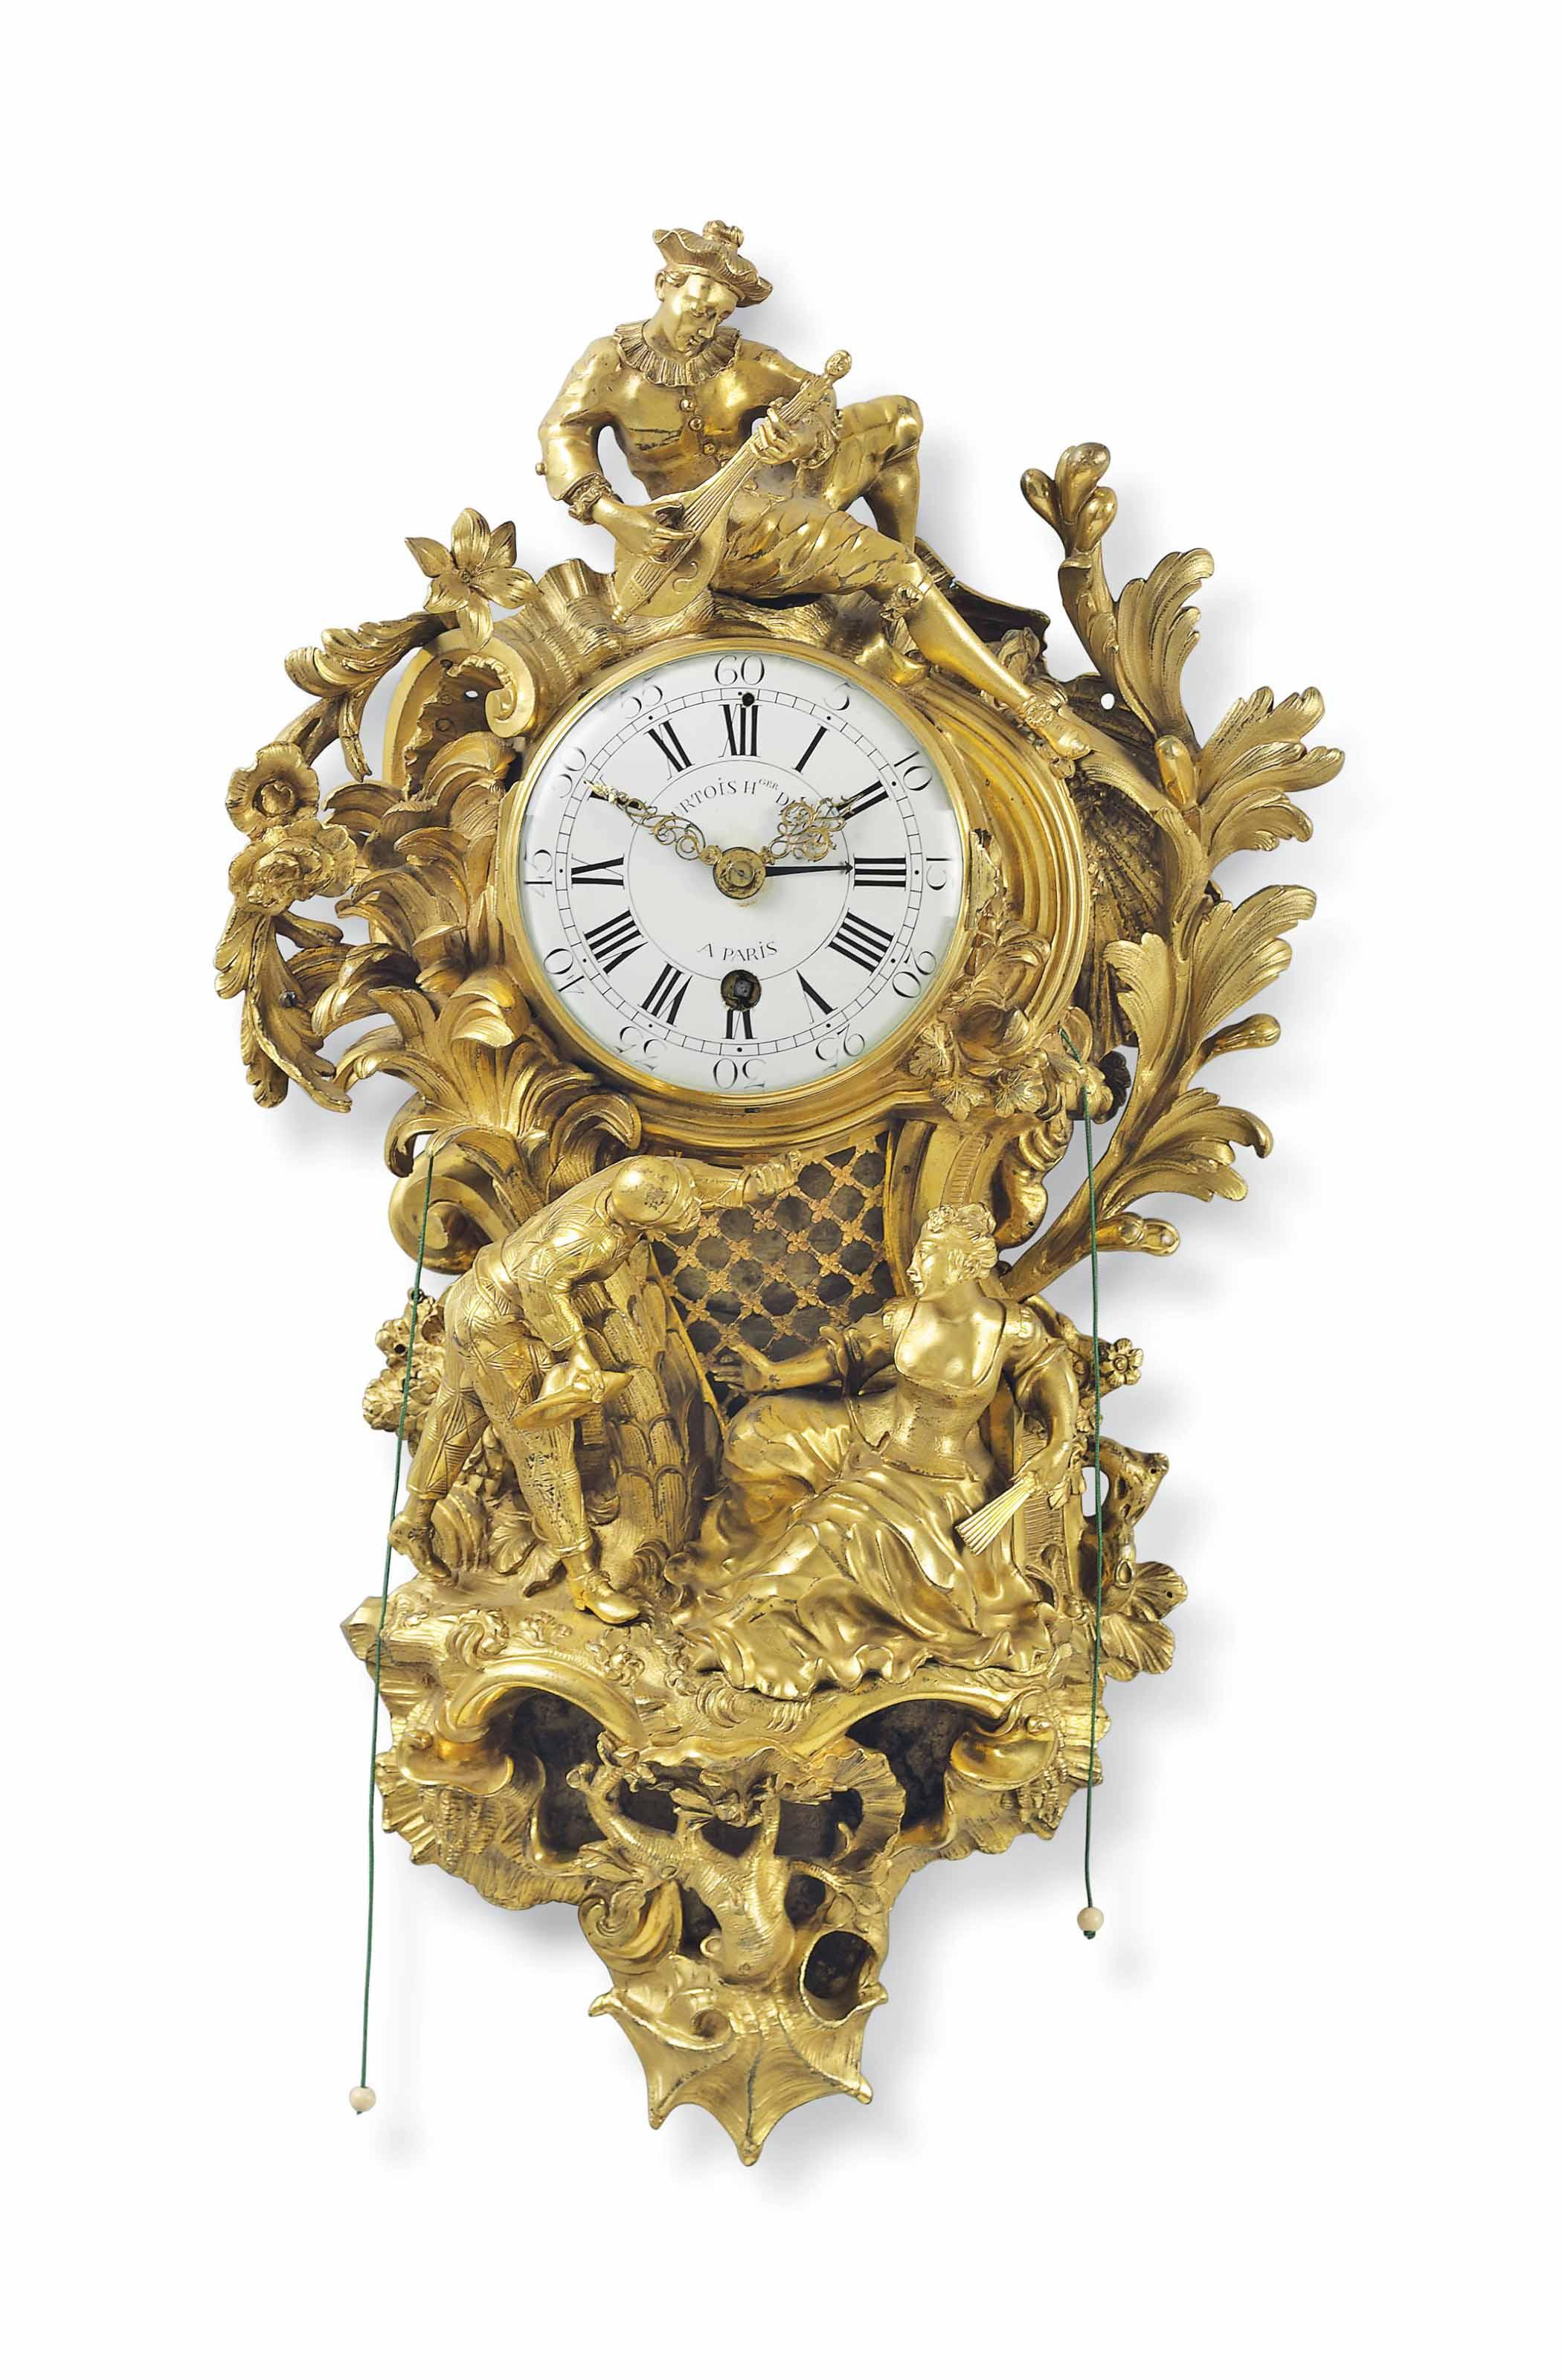 A LOUIS XV ORMOLU CARTEL TIMEP